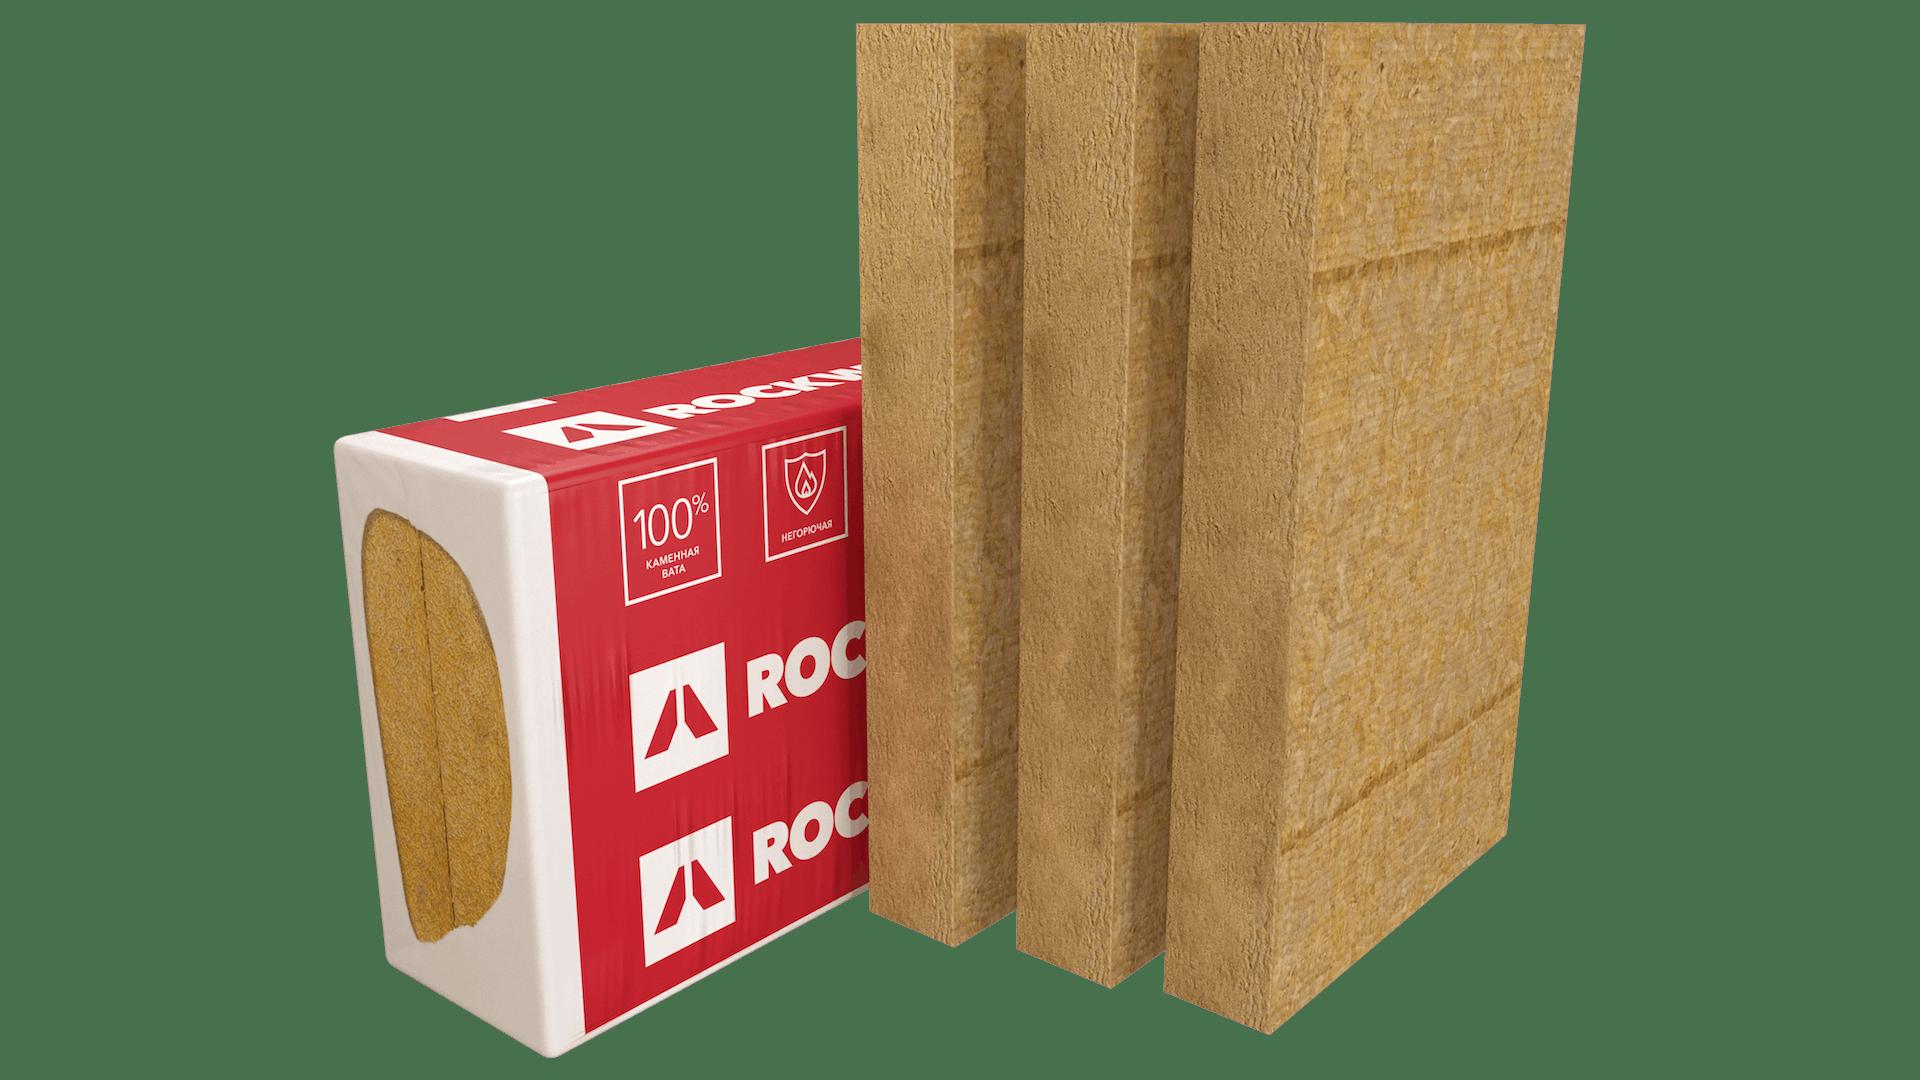 RUF BATTS D OPTIMA, RUF BATTS, roof, roof insulation